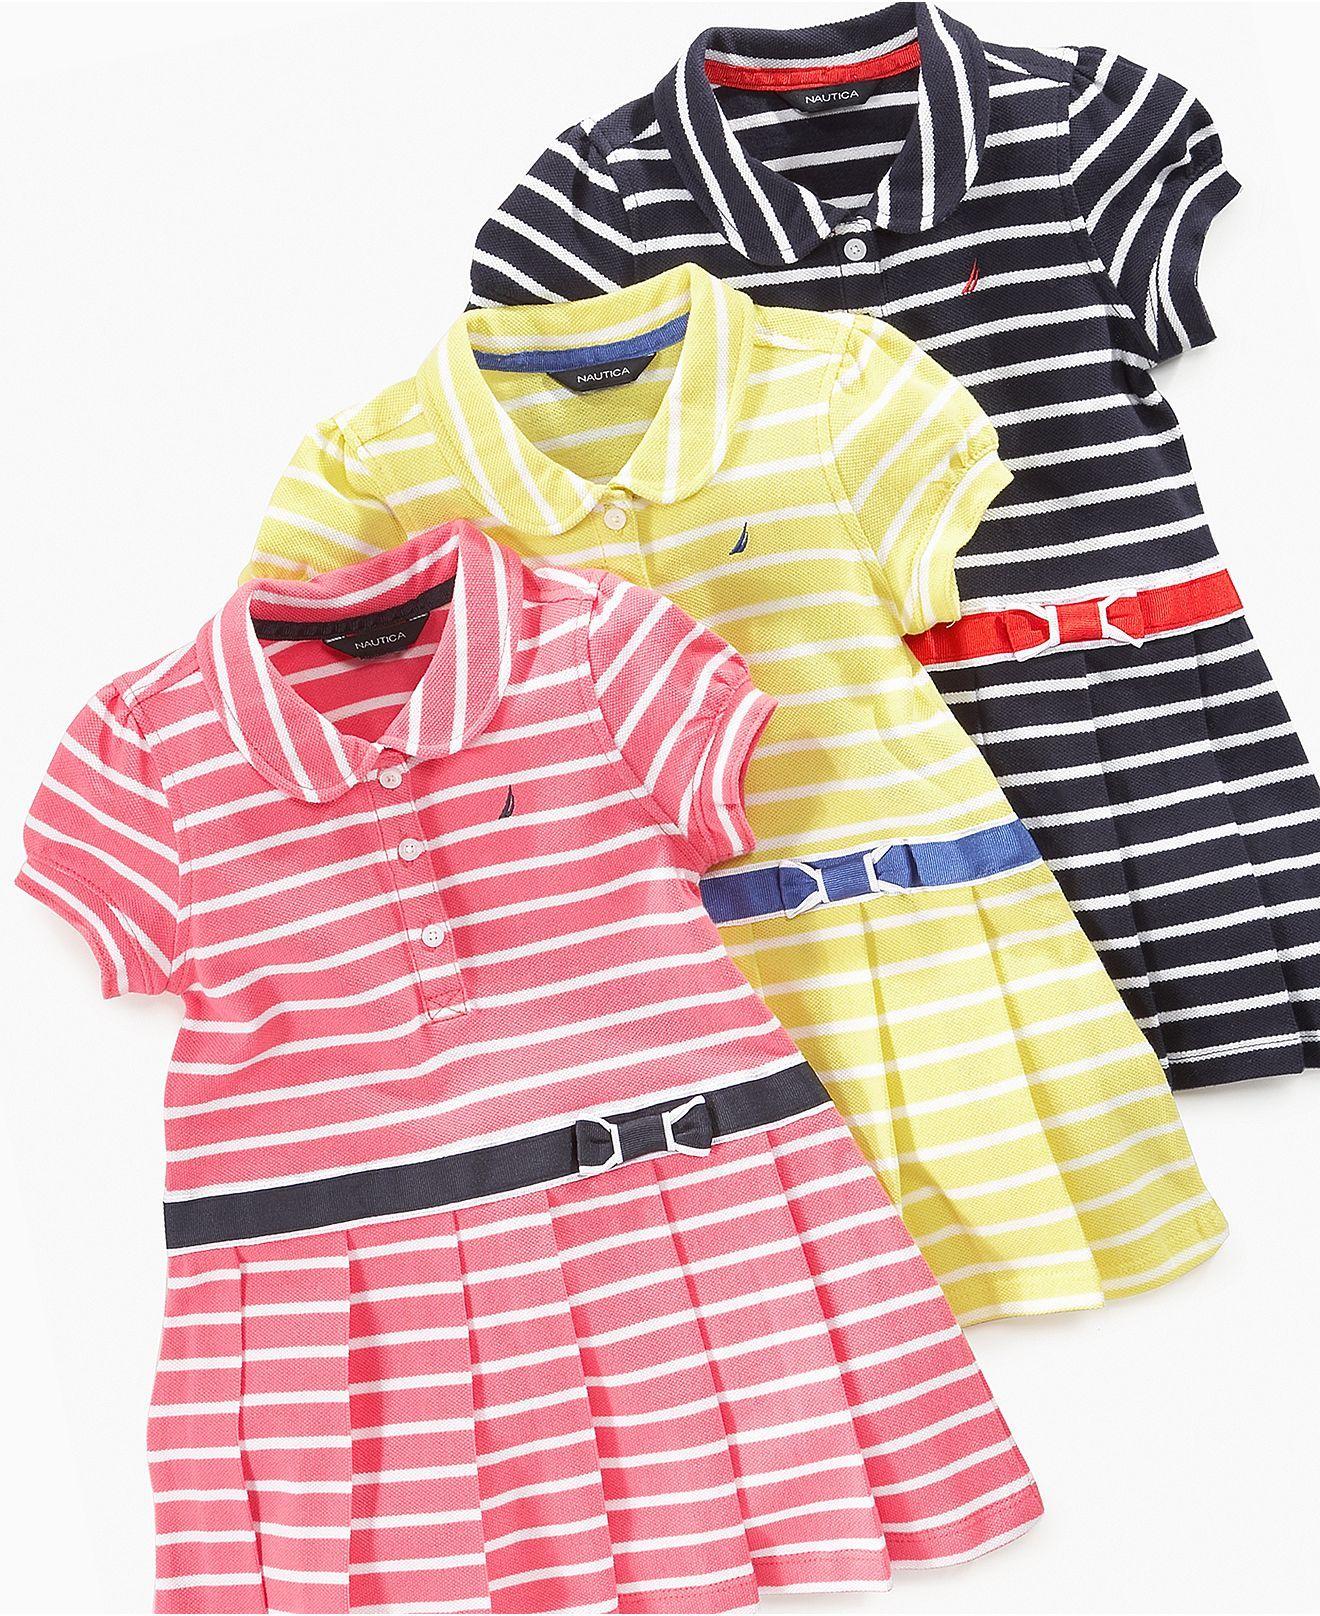 Nautica Baby Dress Baby Girs Polo Dress Kids Baby Girl 0 24